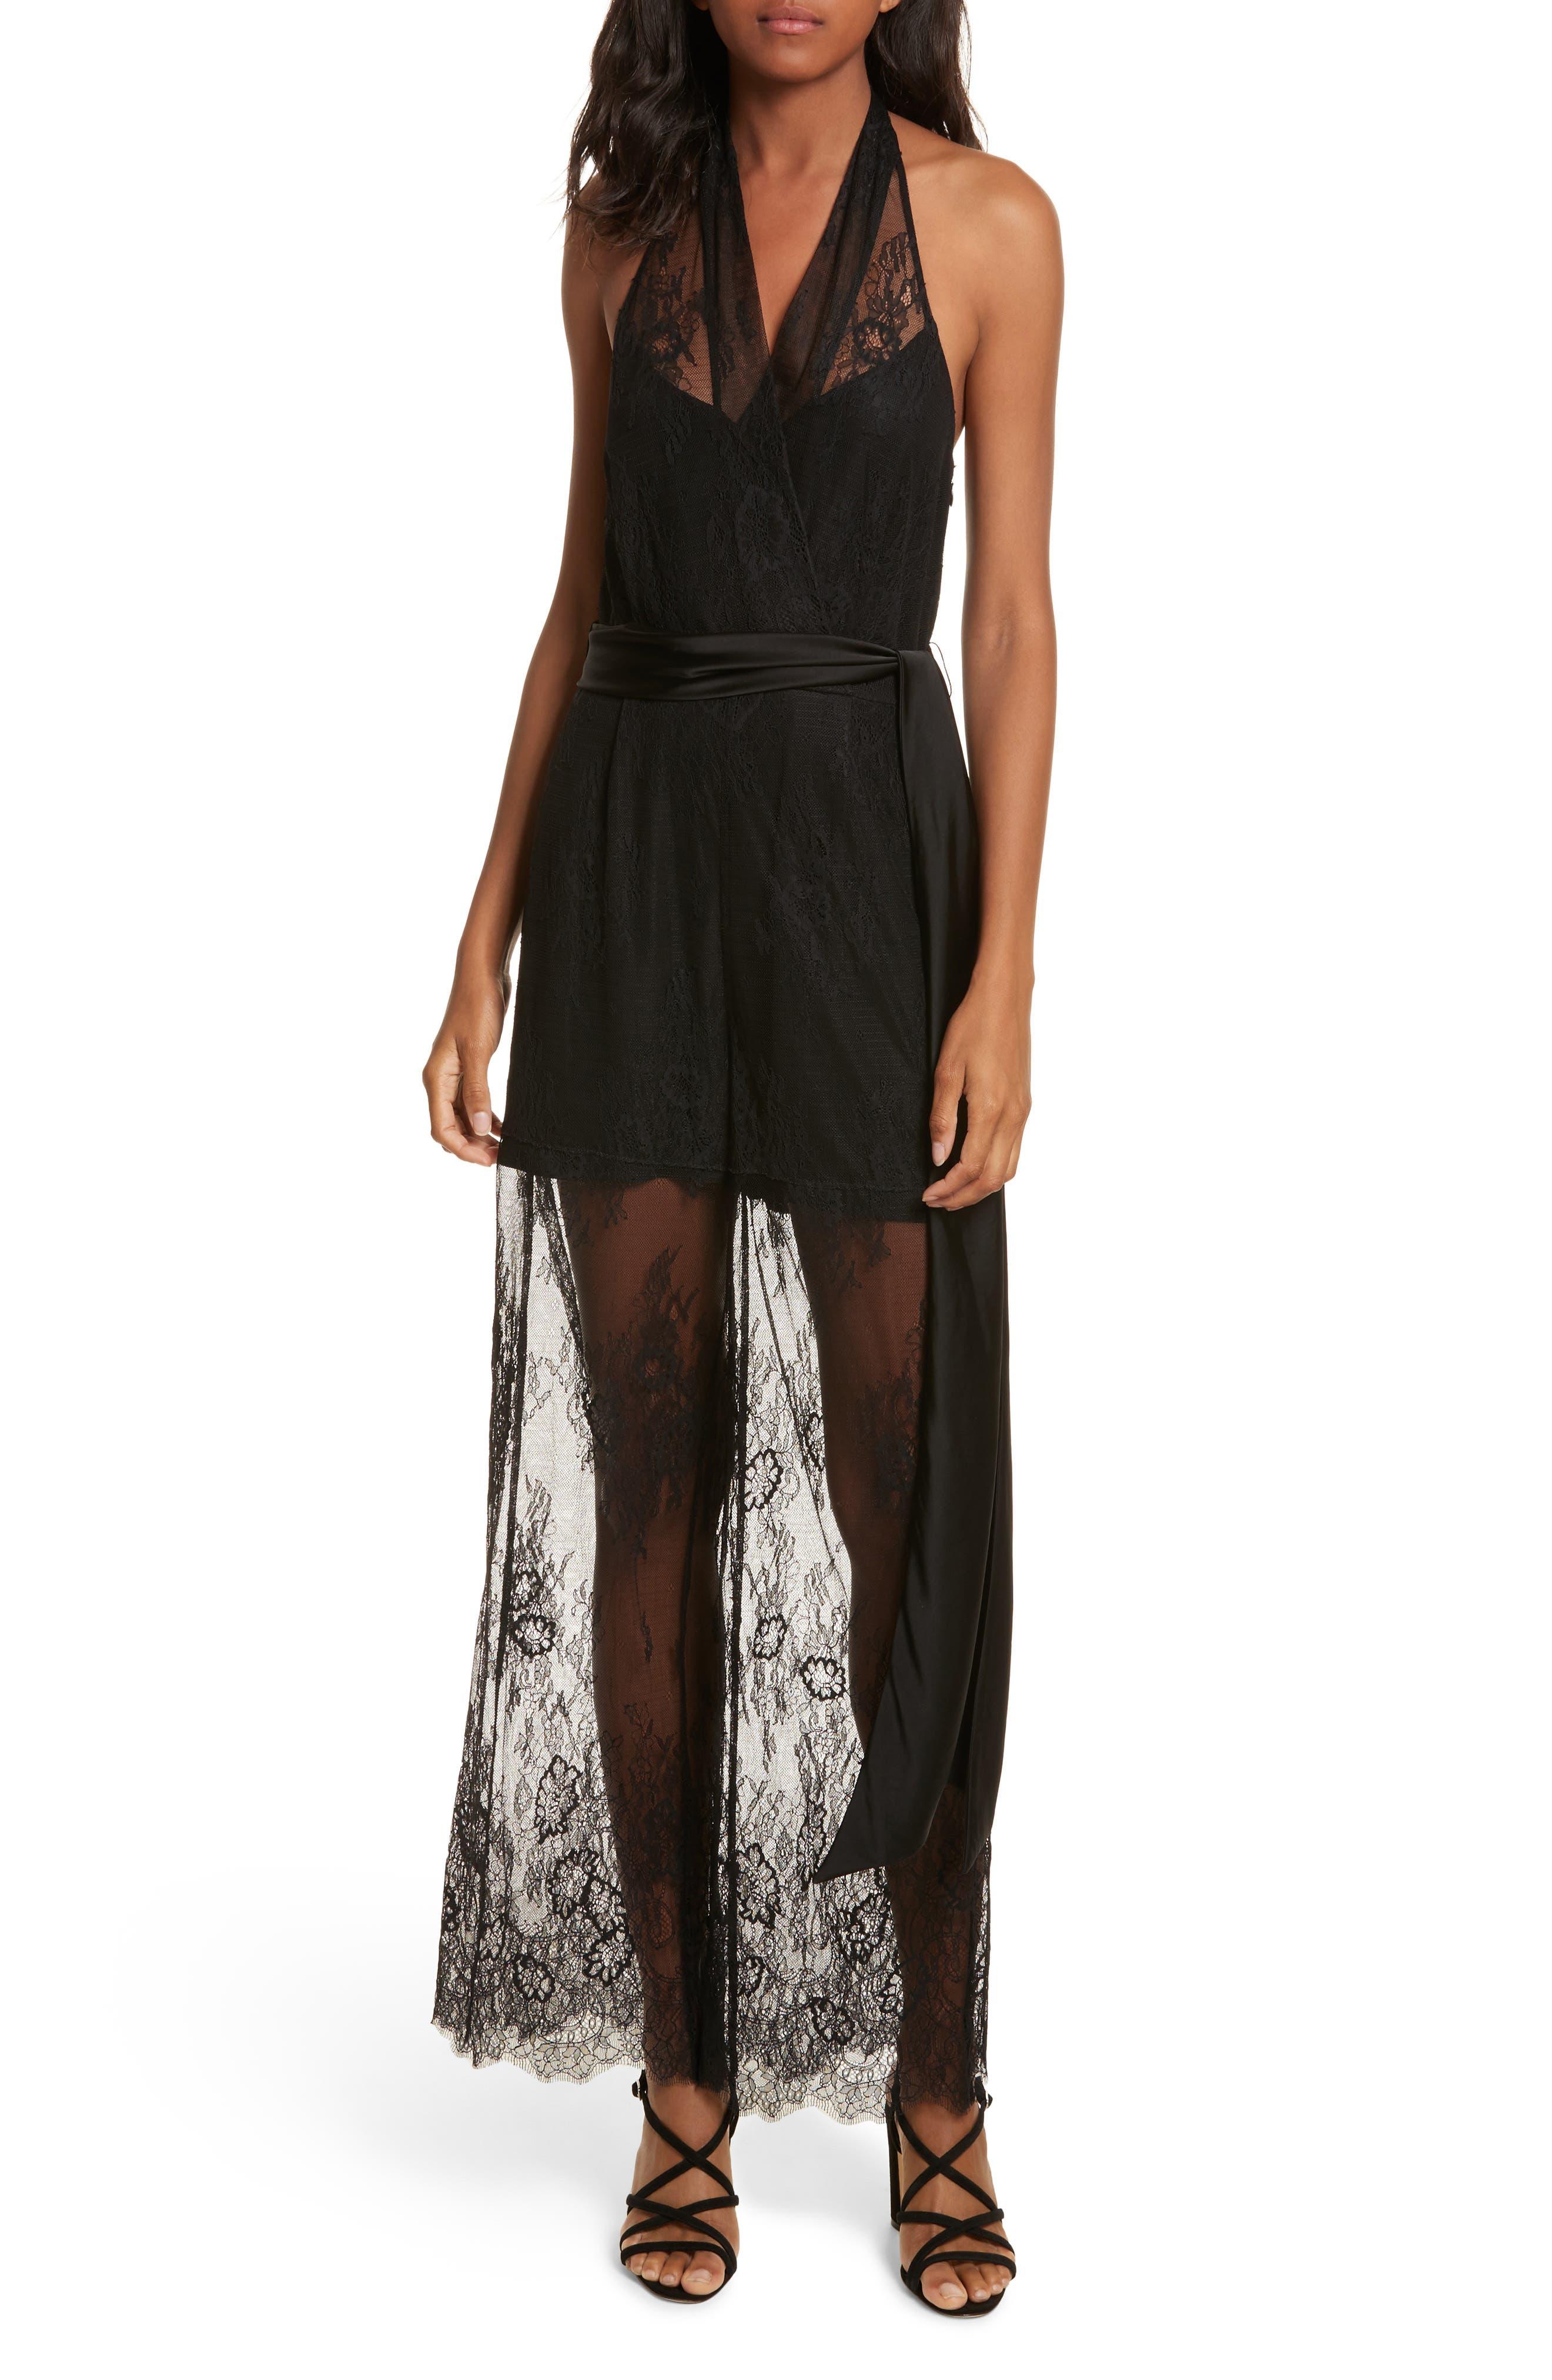 Diane von Furstenberg Halter Neck Lace Jumpsuit,                         Main,                         color, Black